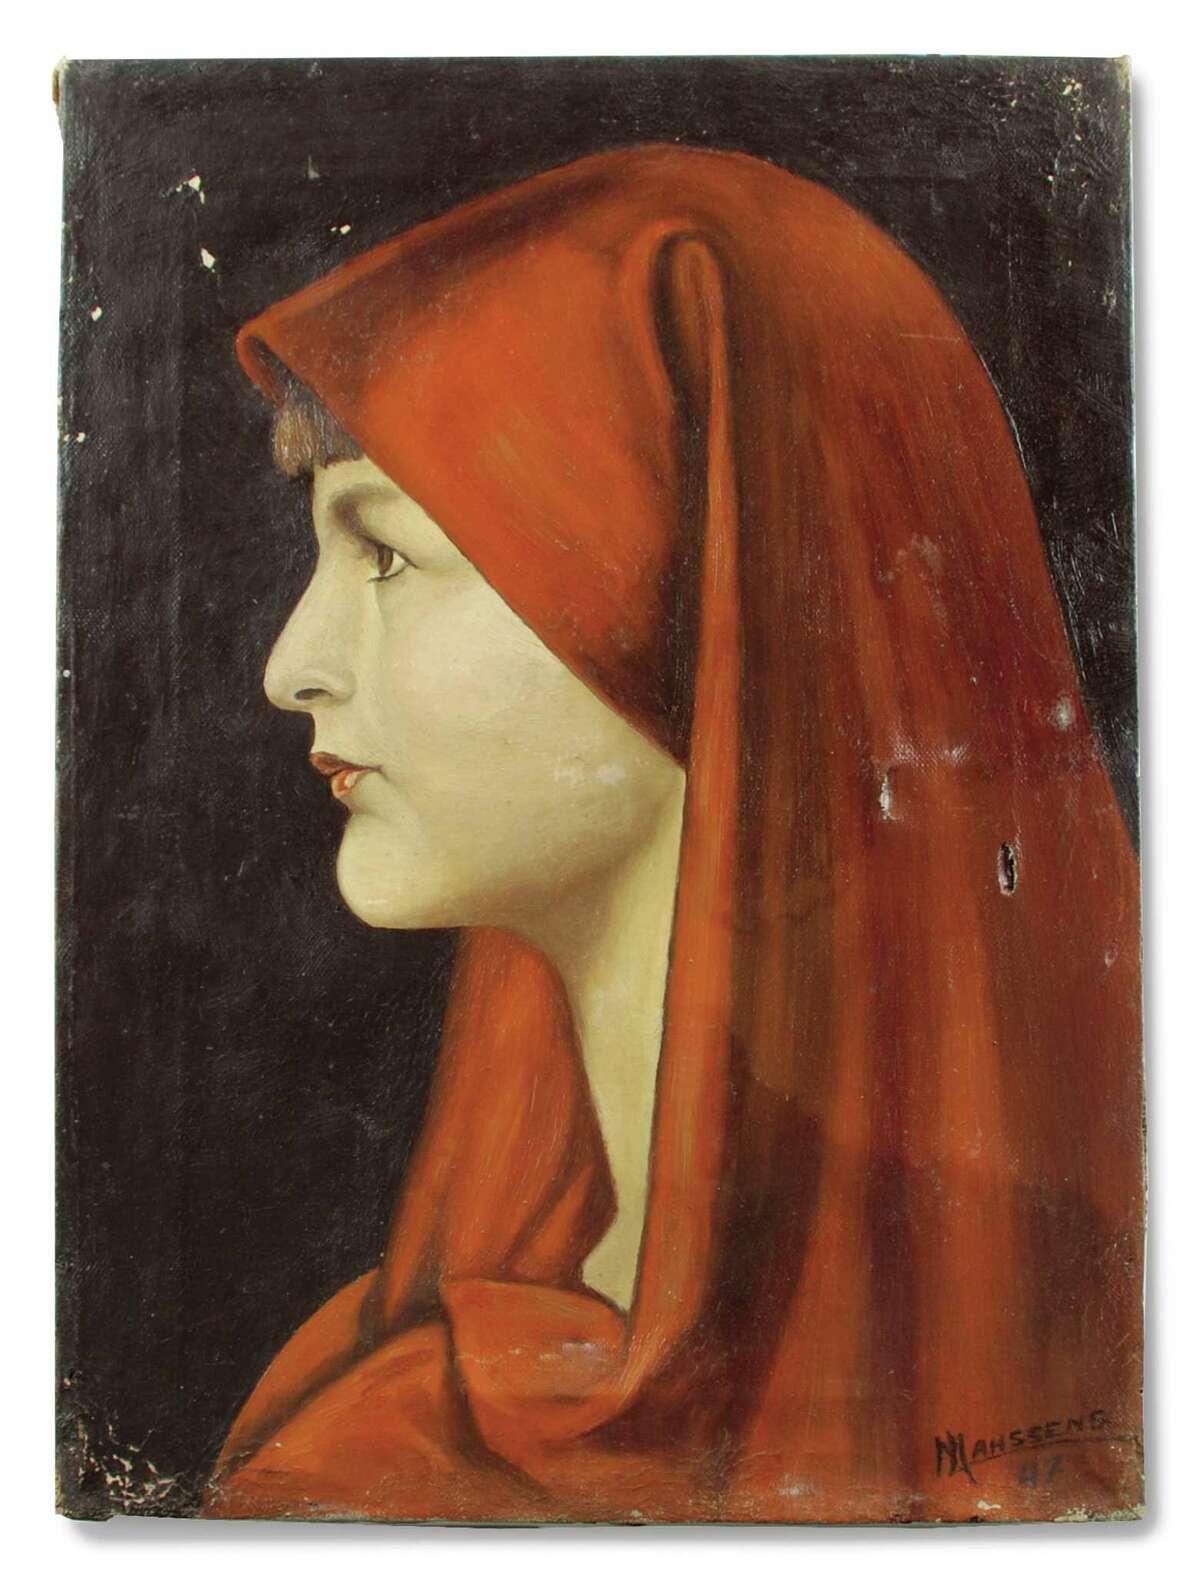 Alÿs found J. Mahssens' oil painting